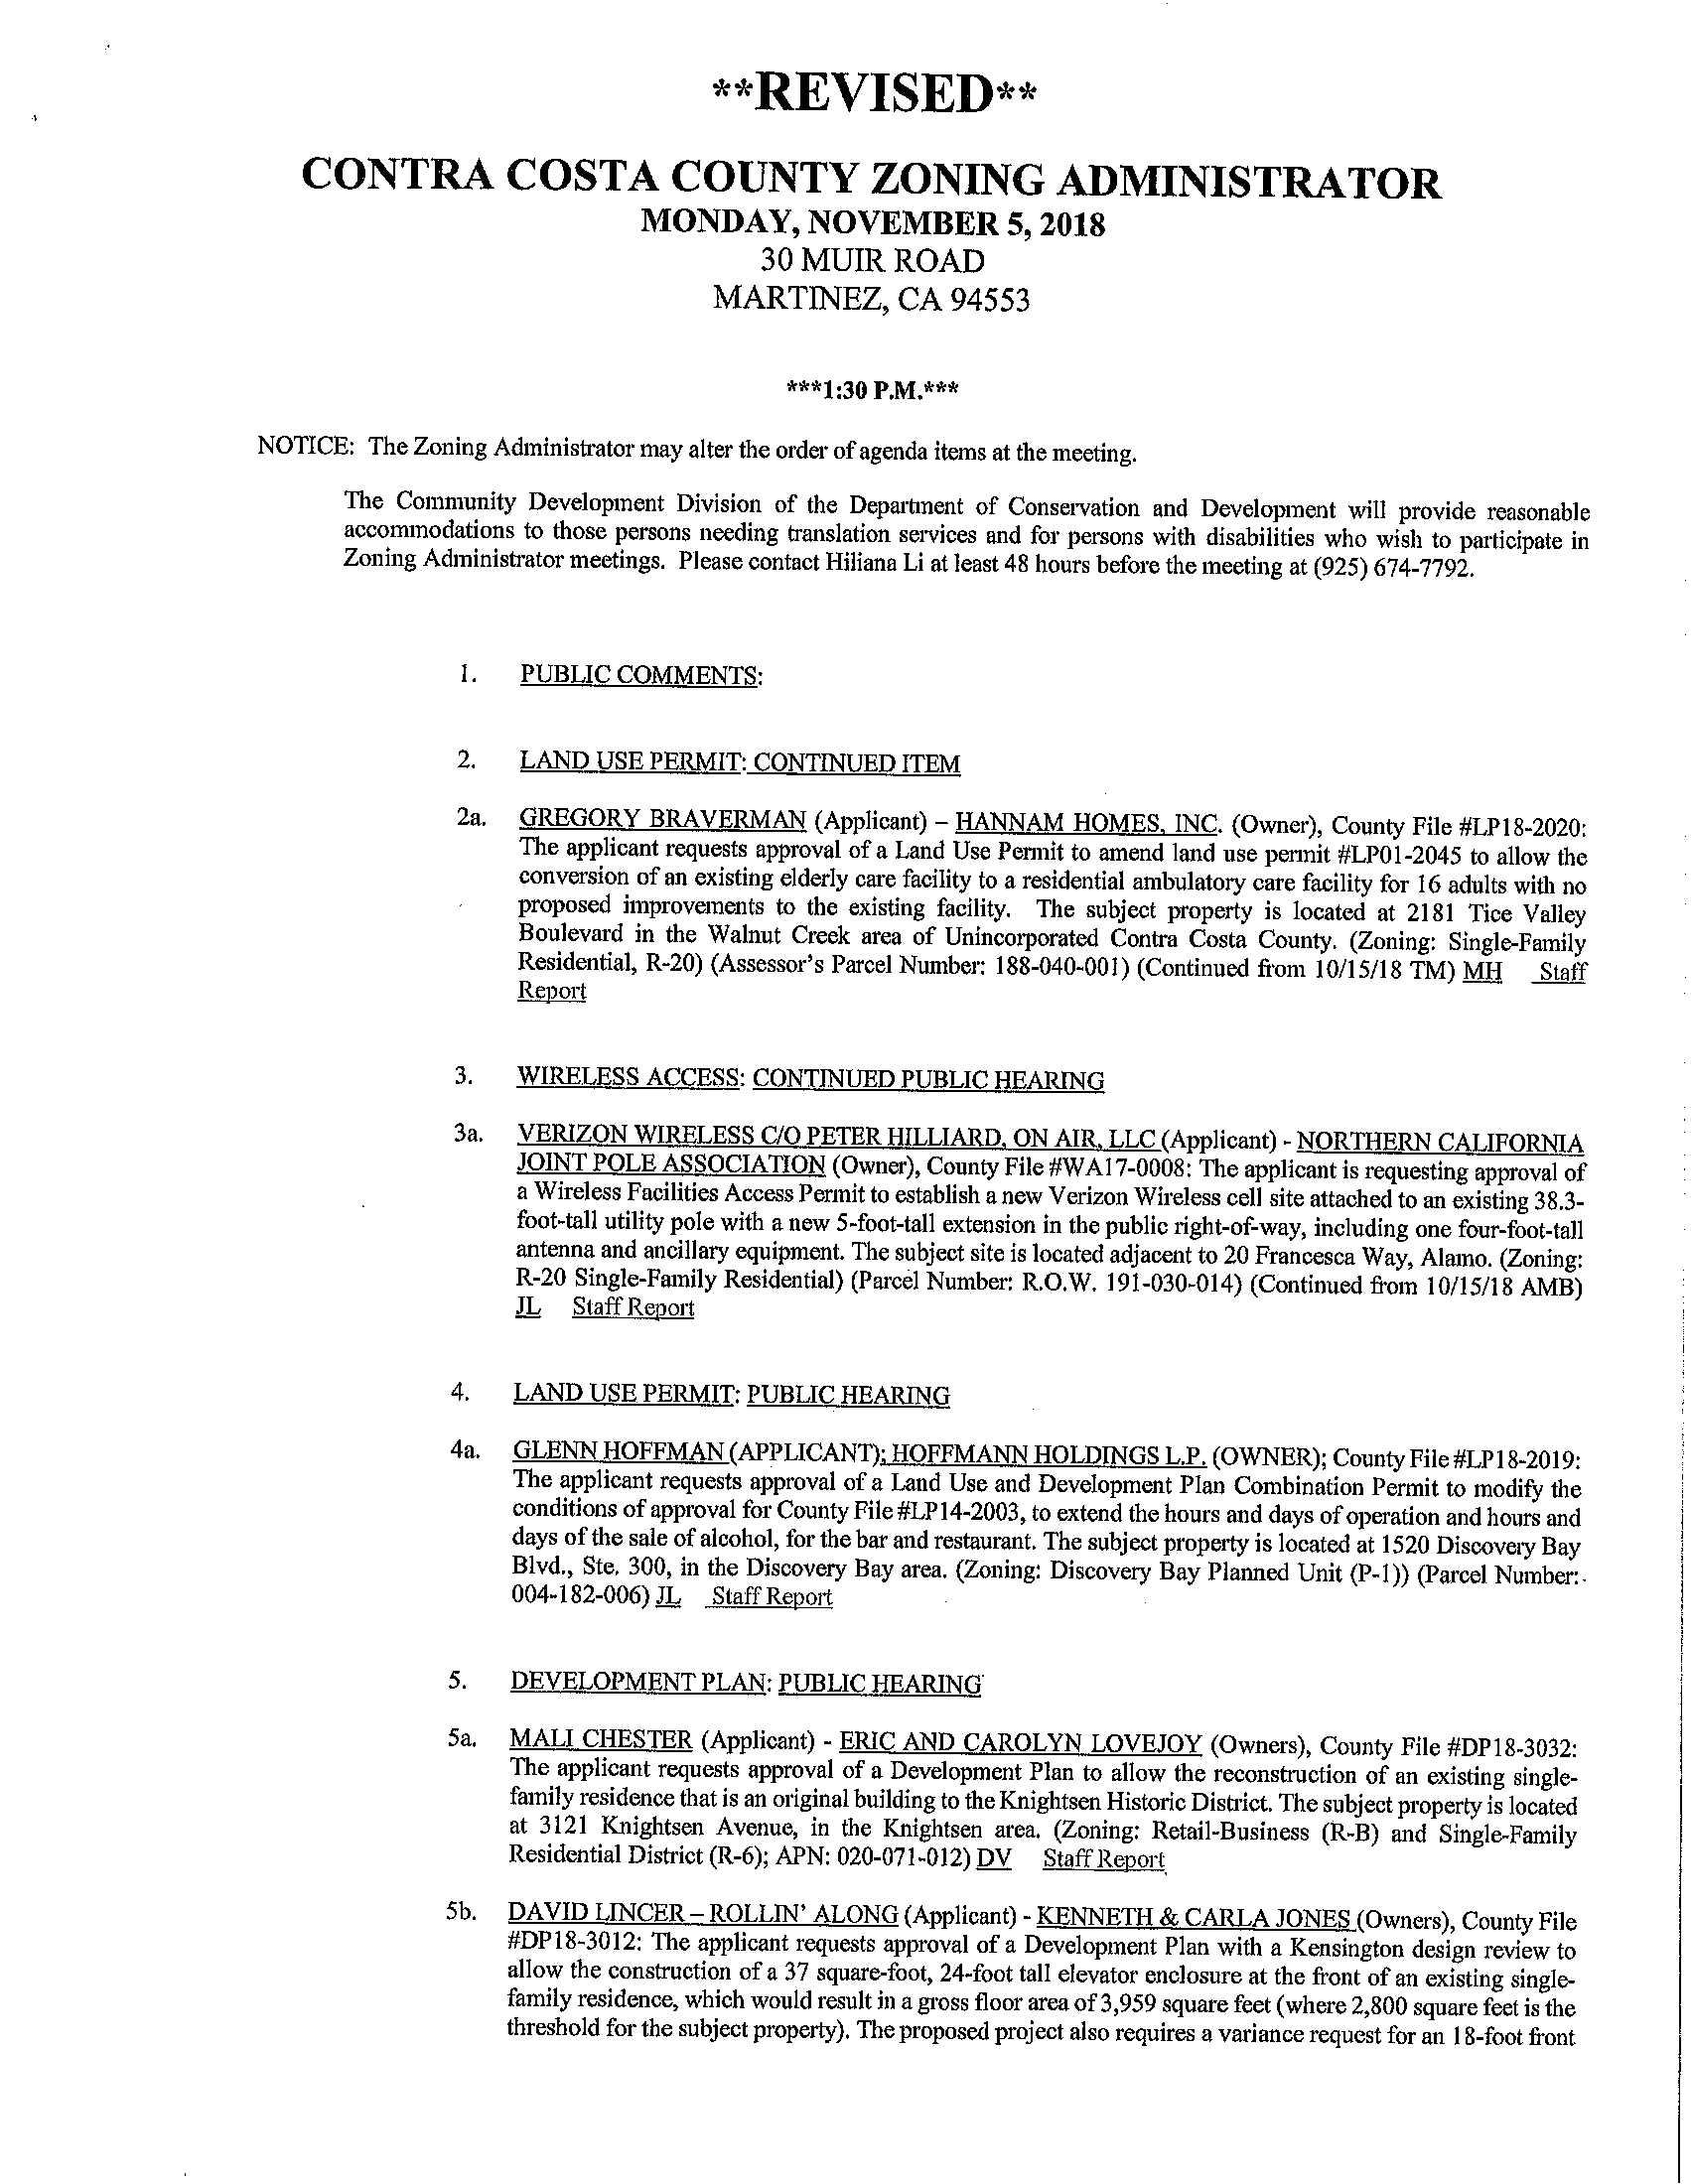 ESMAC Agenda 11.14.2018 (46 Pages)_36.jpg